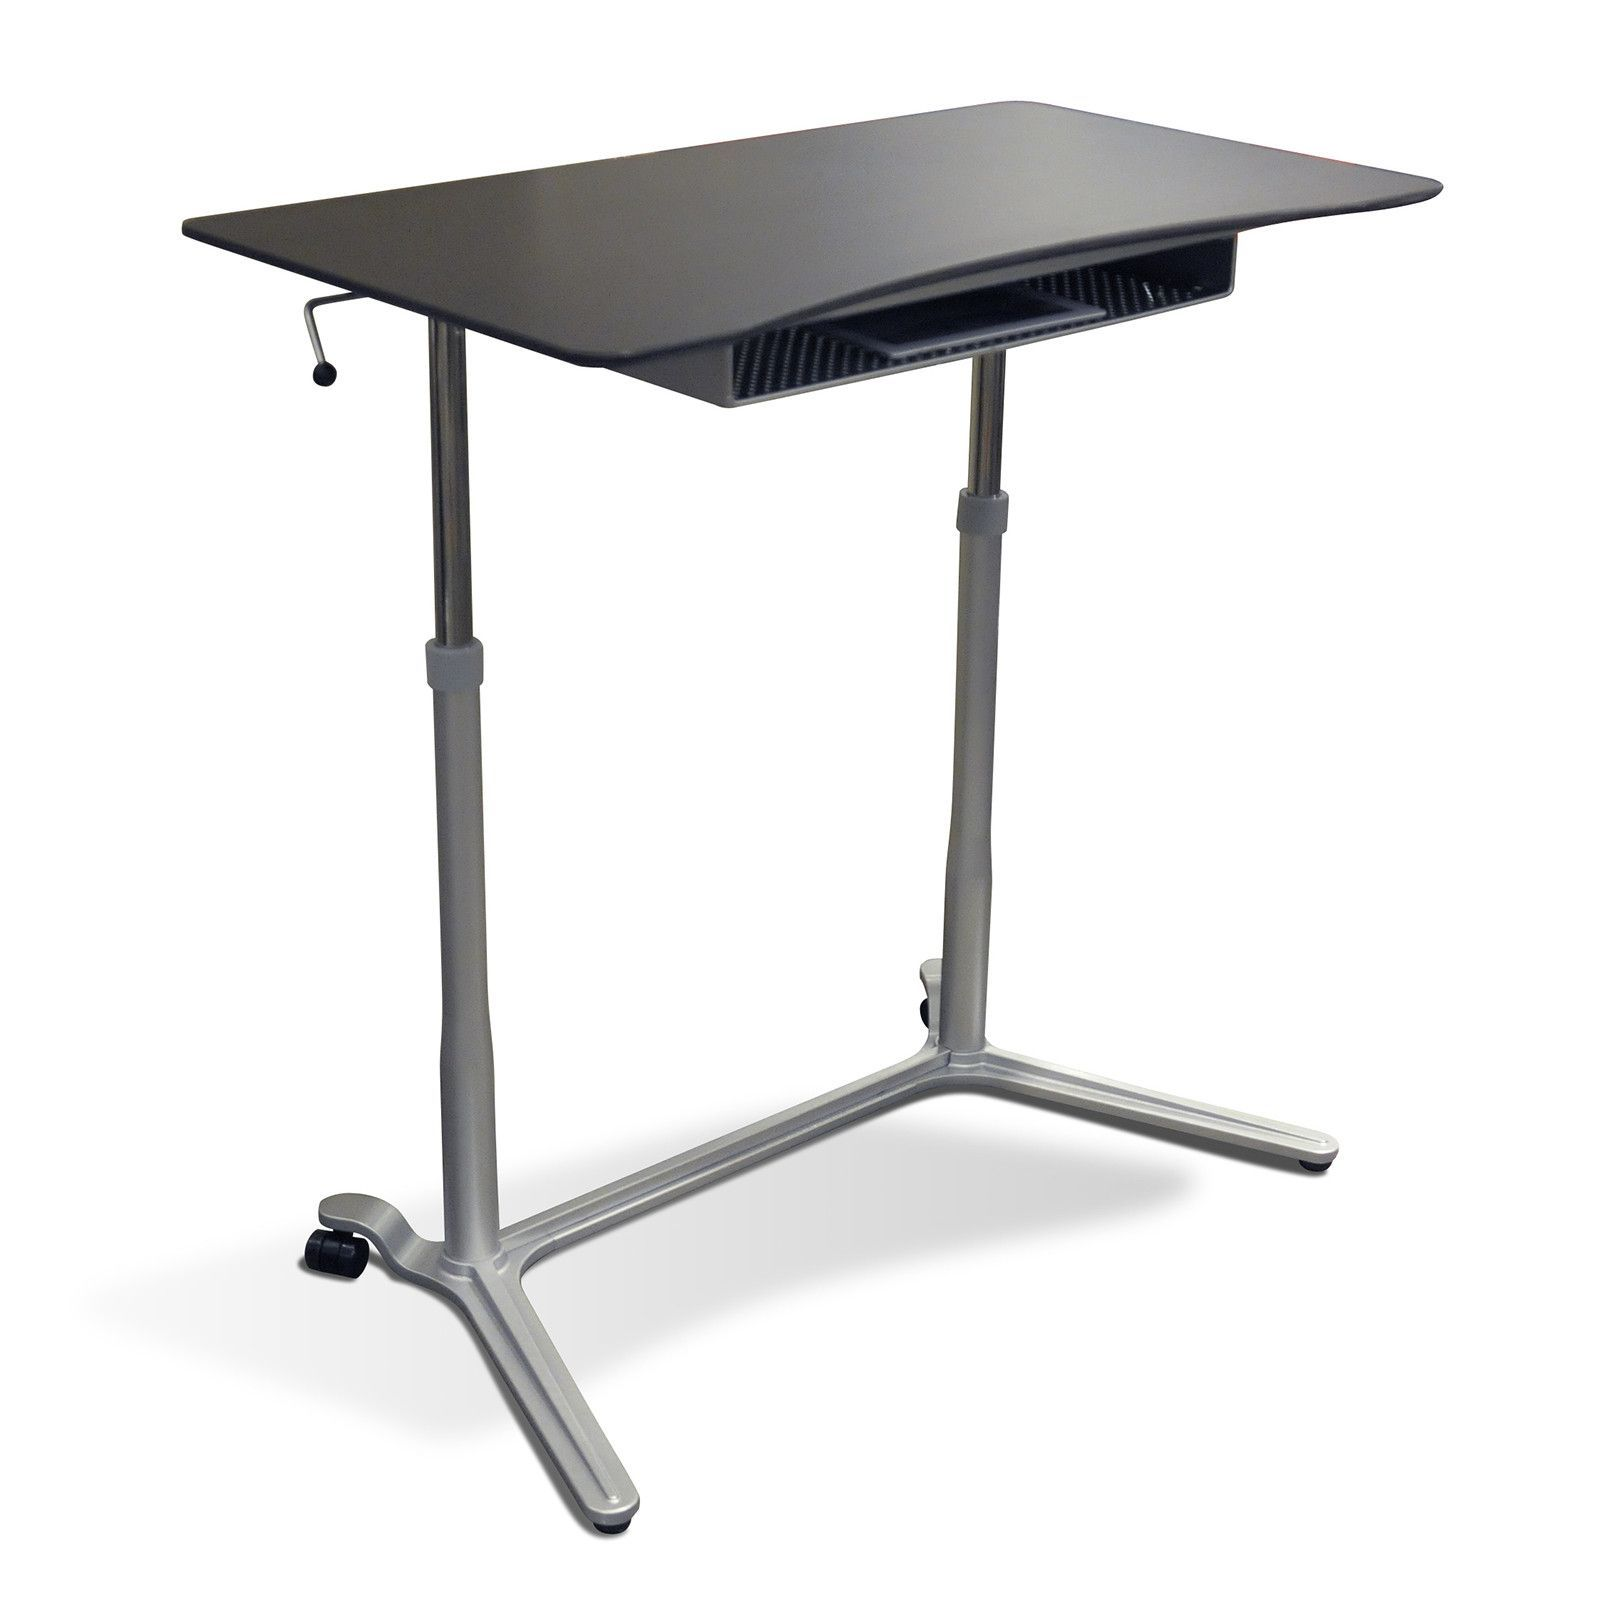 Office folding tables jesper office  height adjustable sit stand desk in espresso